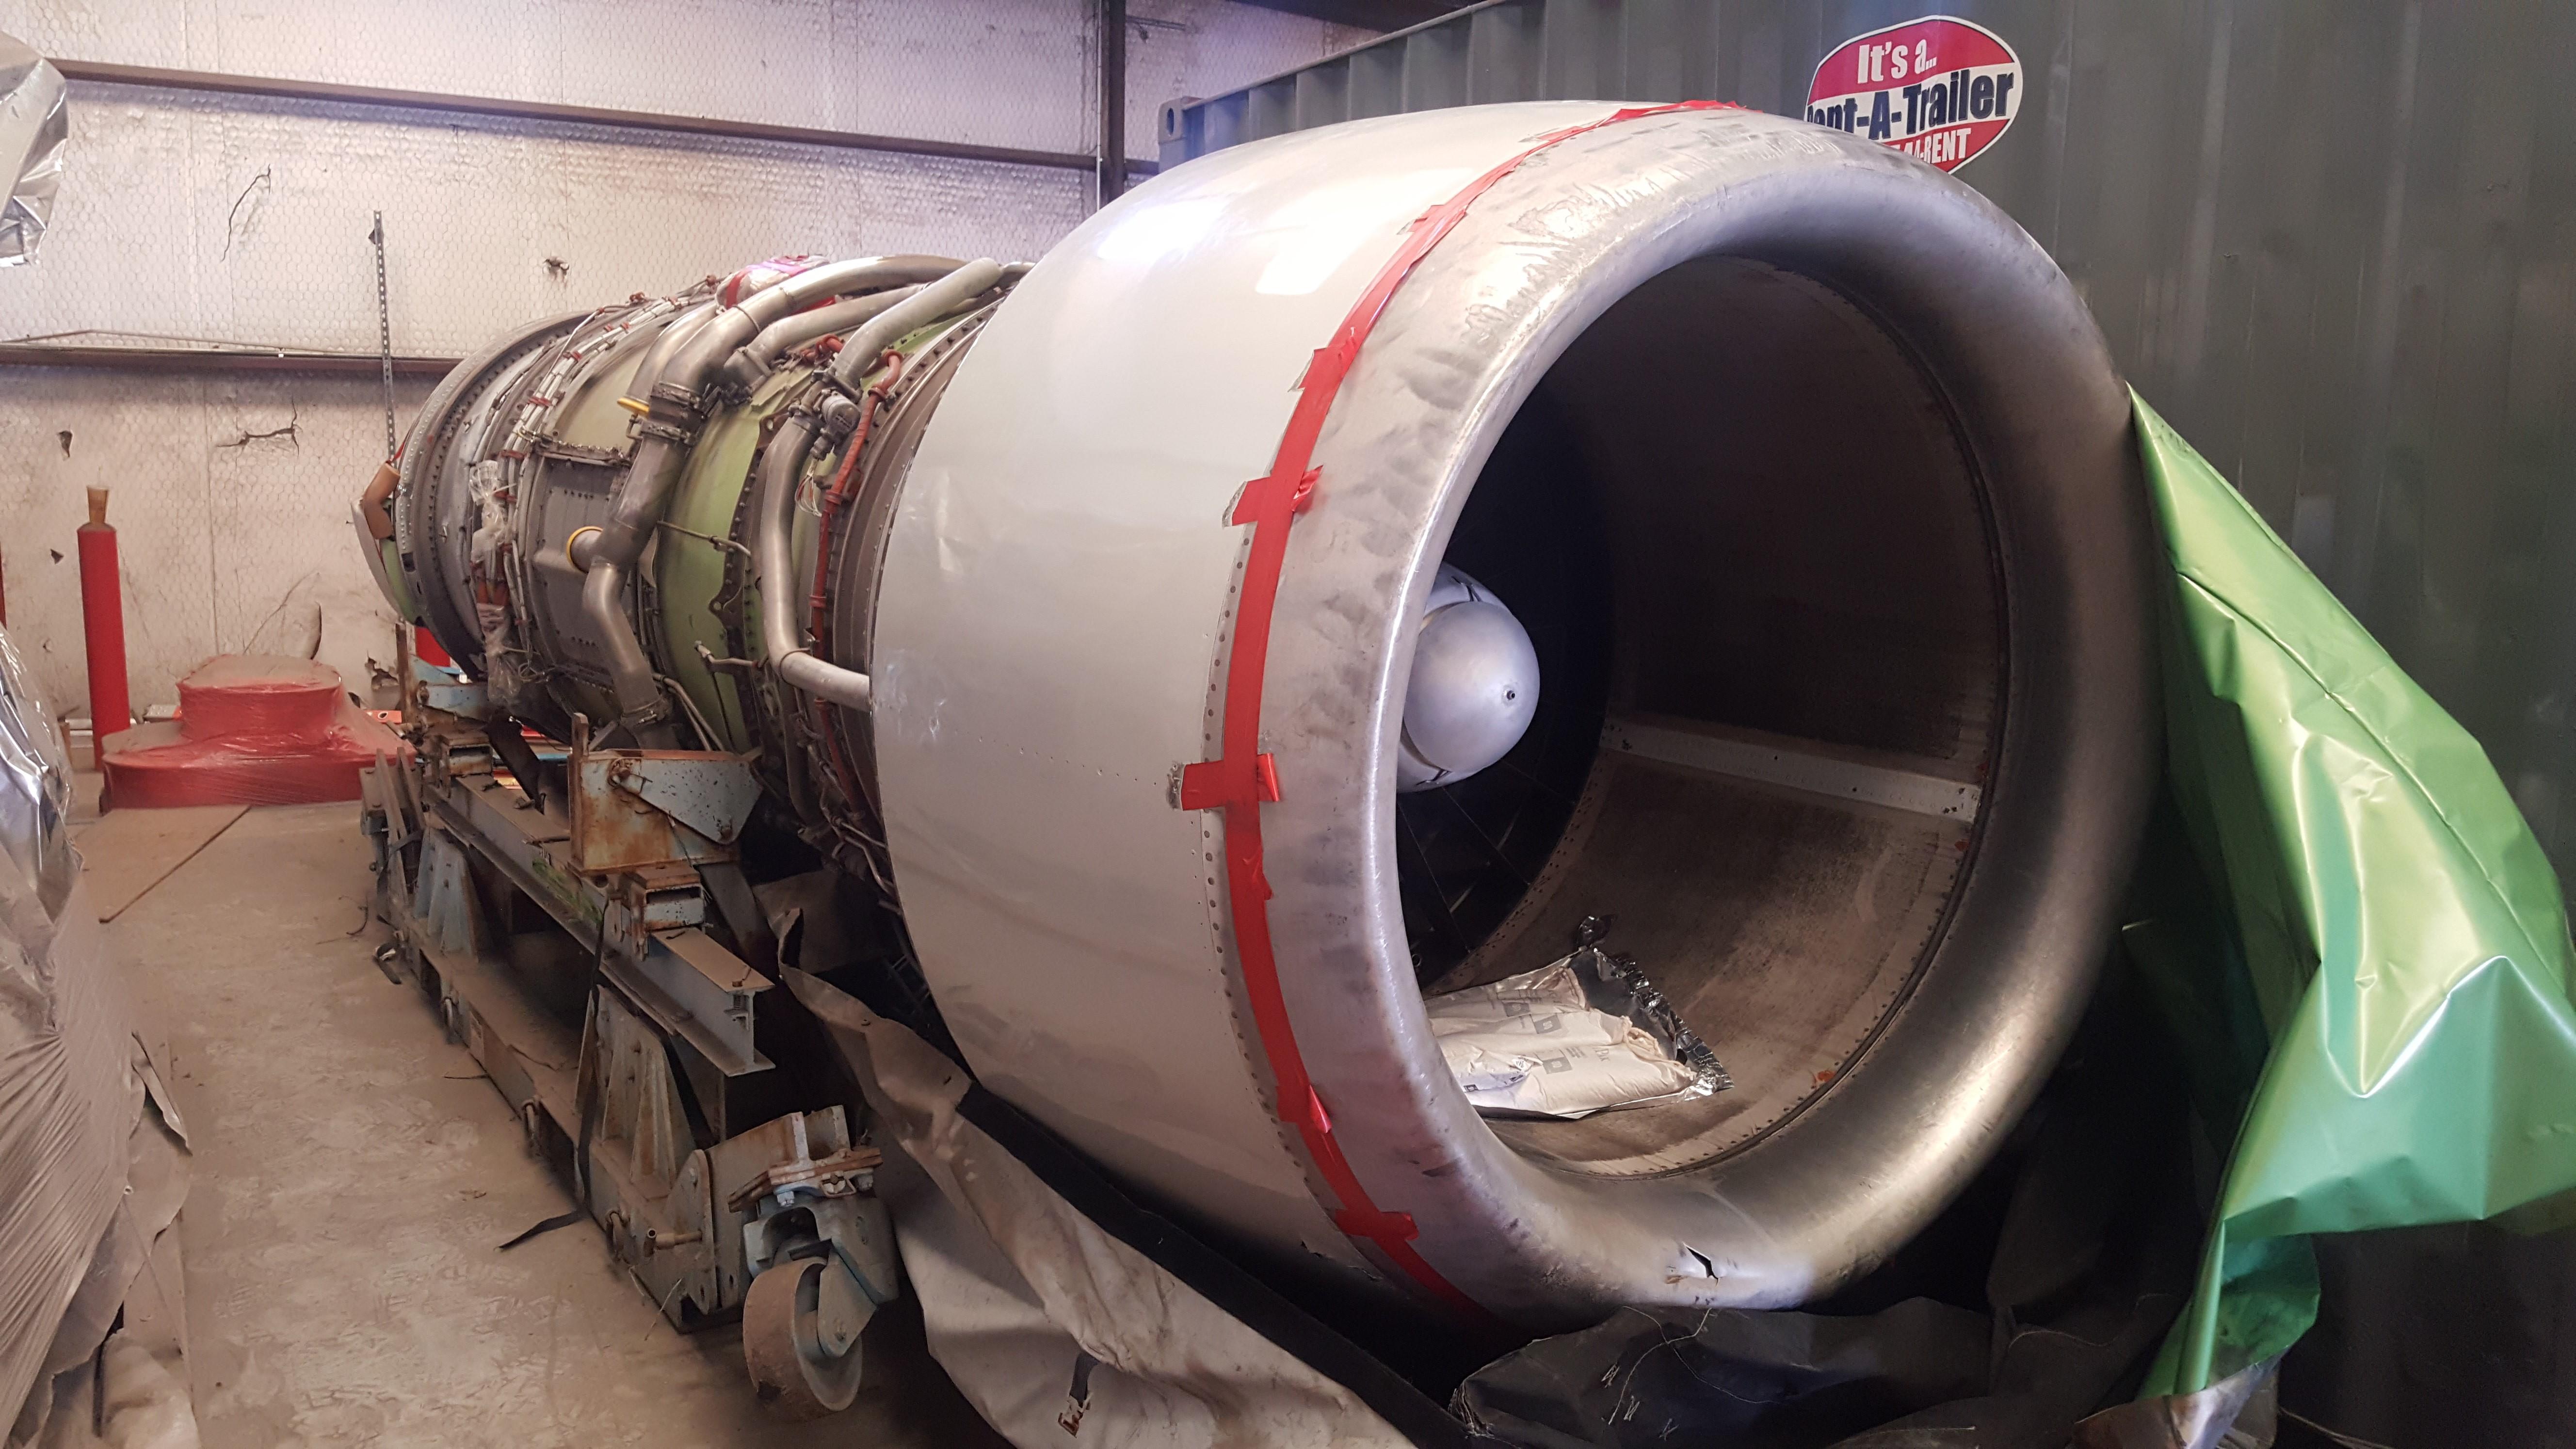 Prat & Whittney MD-82 Jet Engines (1)